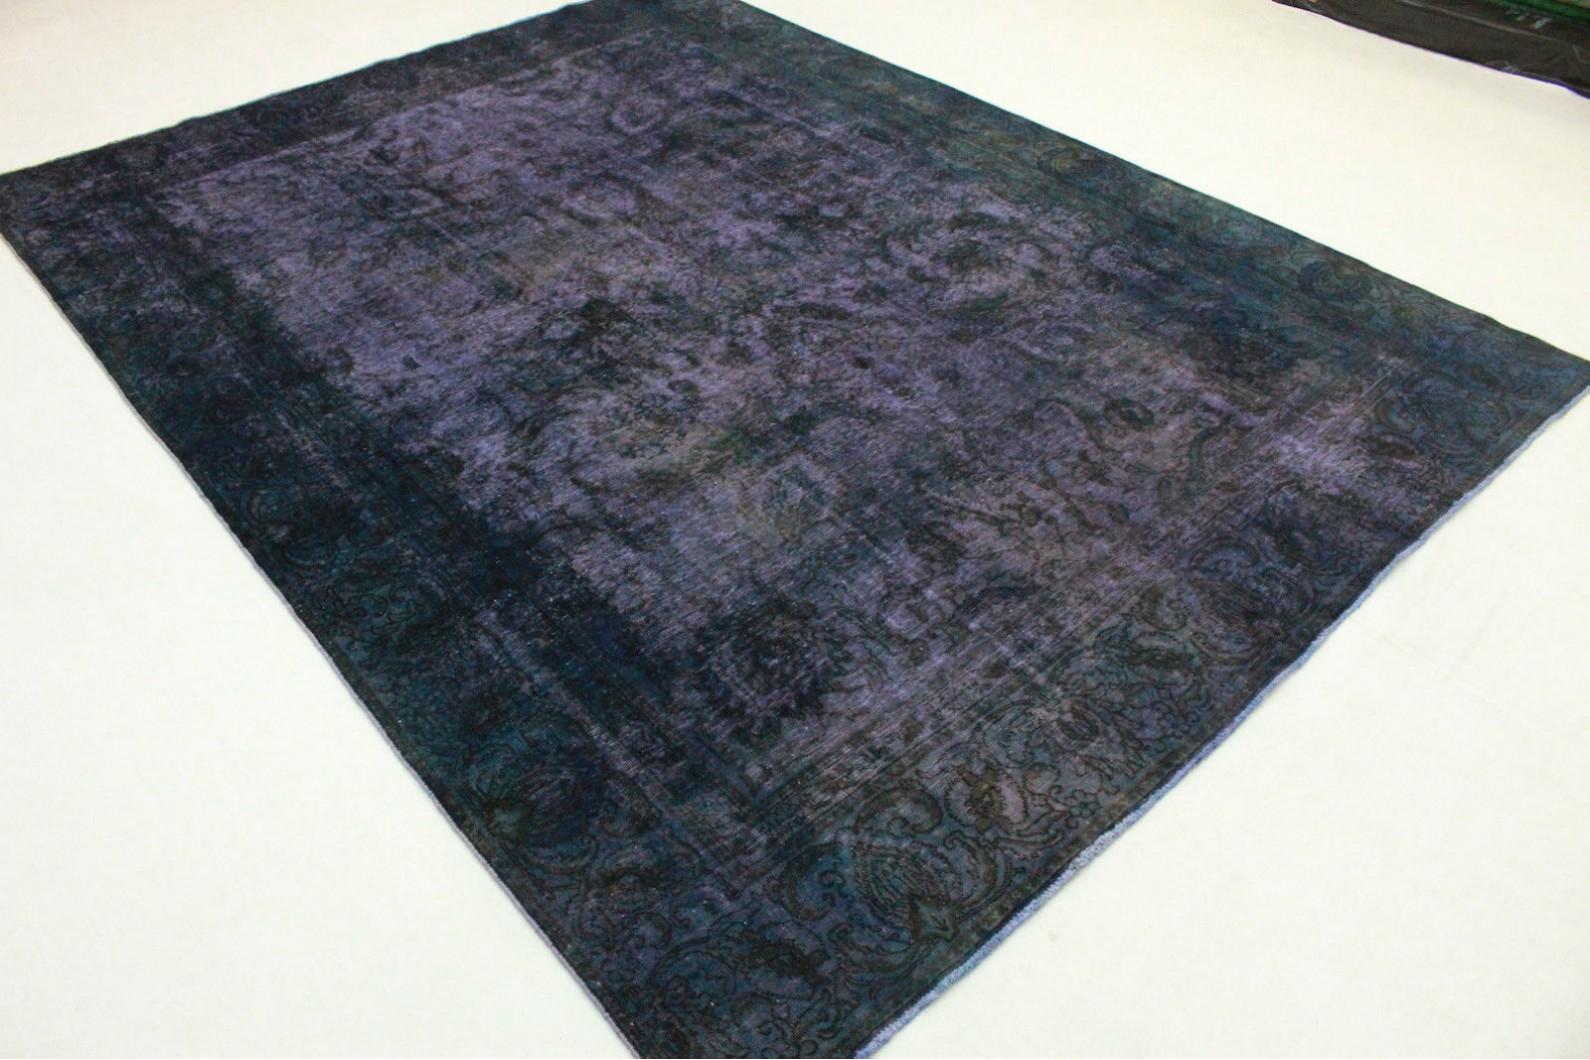 vintage teppich lila in 370x280cm 1001 3440 bei kaufen. Black Bedroom Furniture Sets. Home Design Ideas